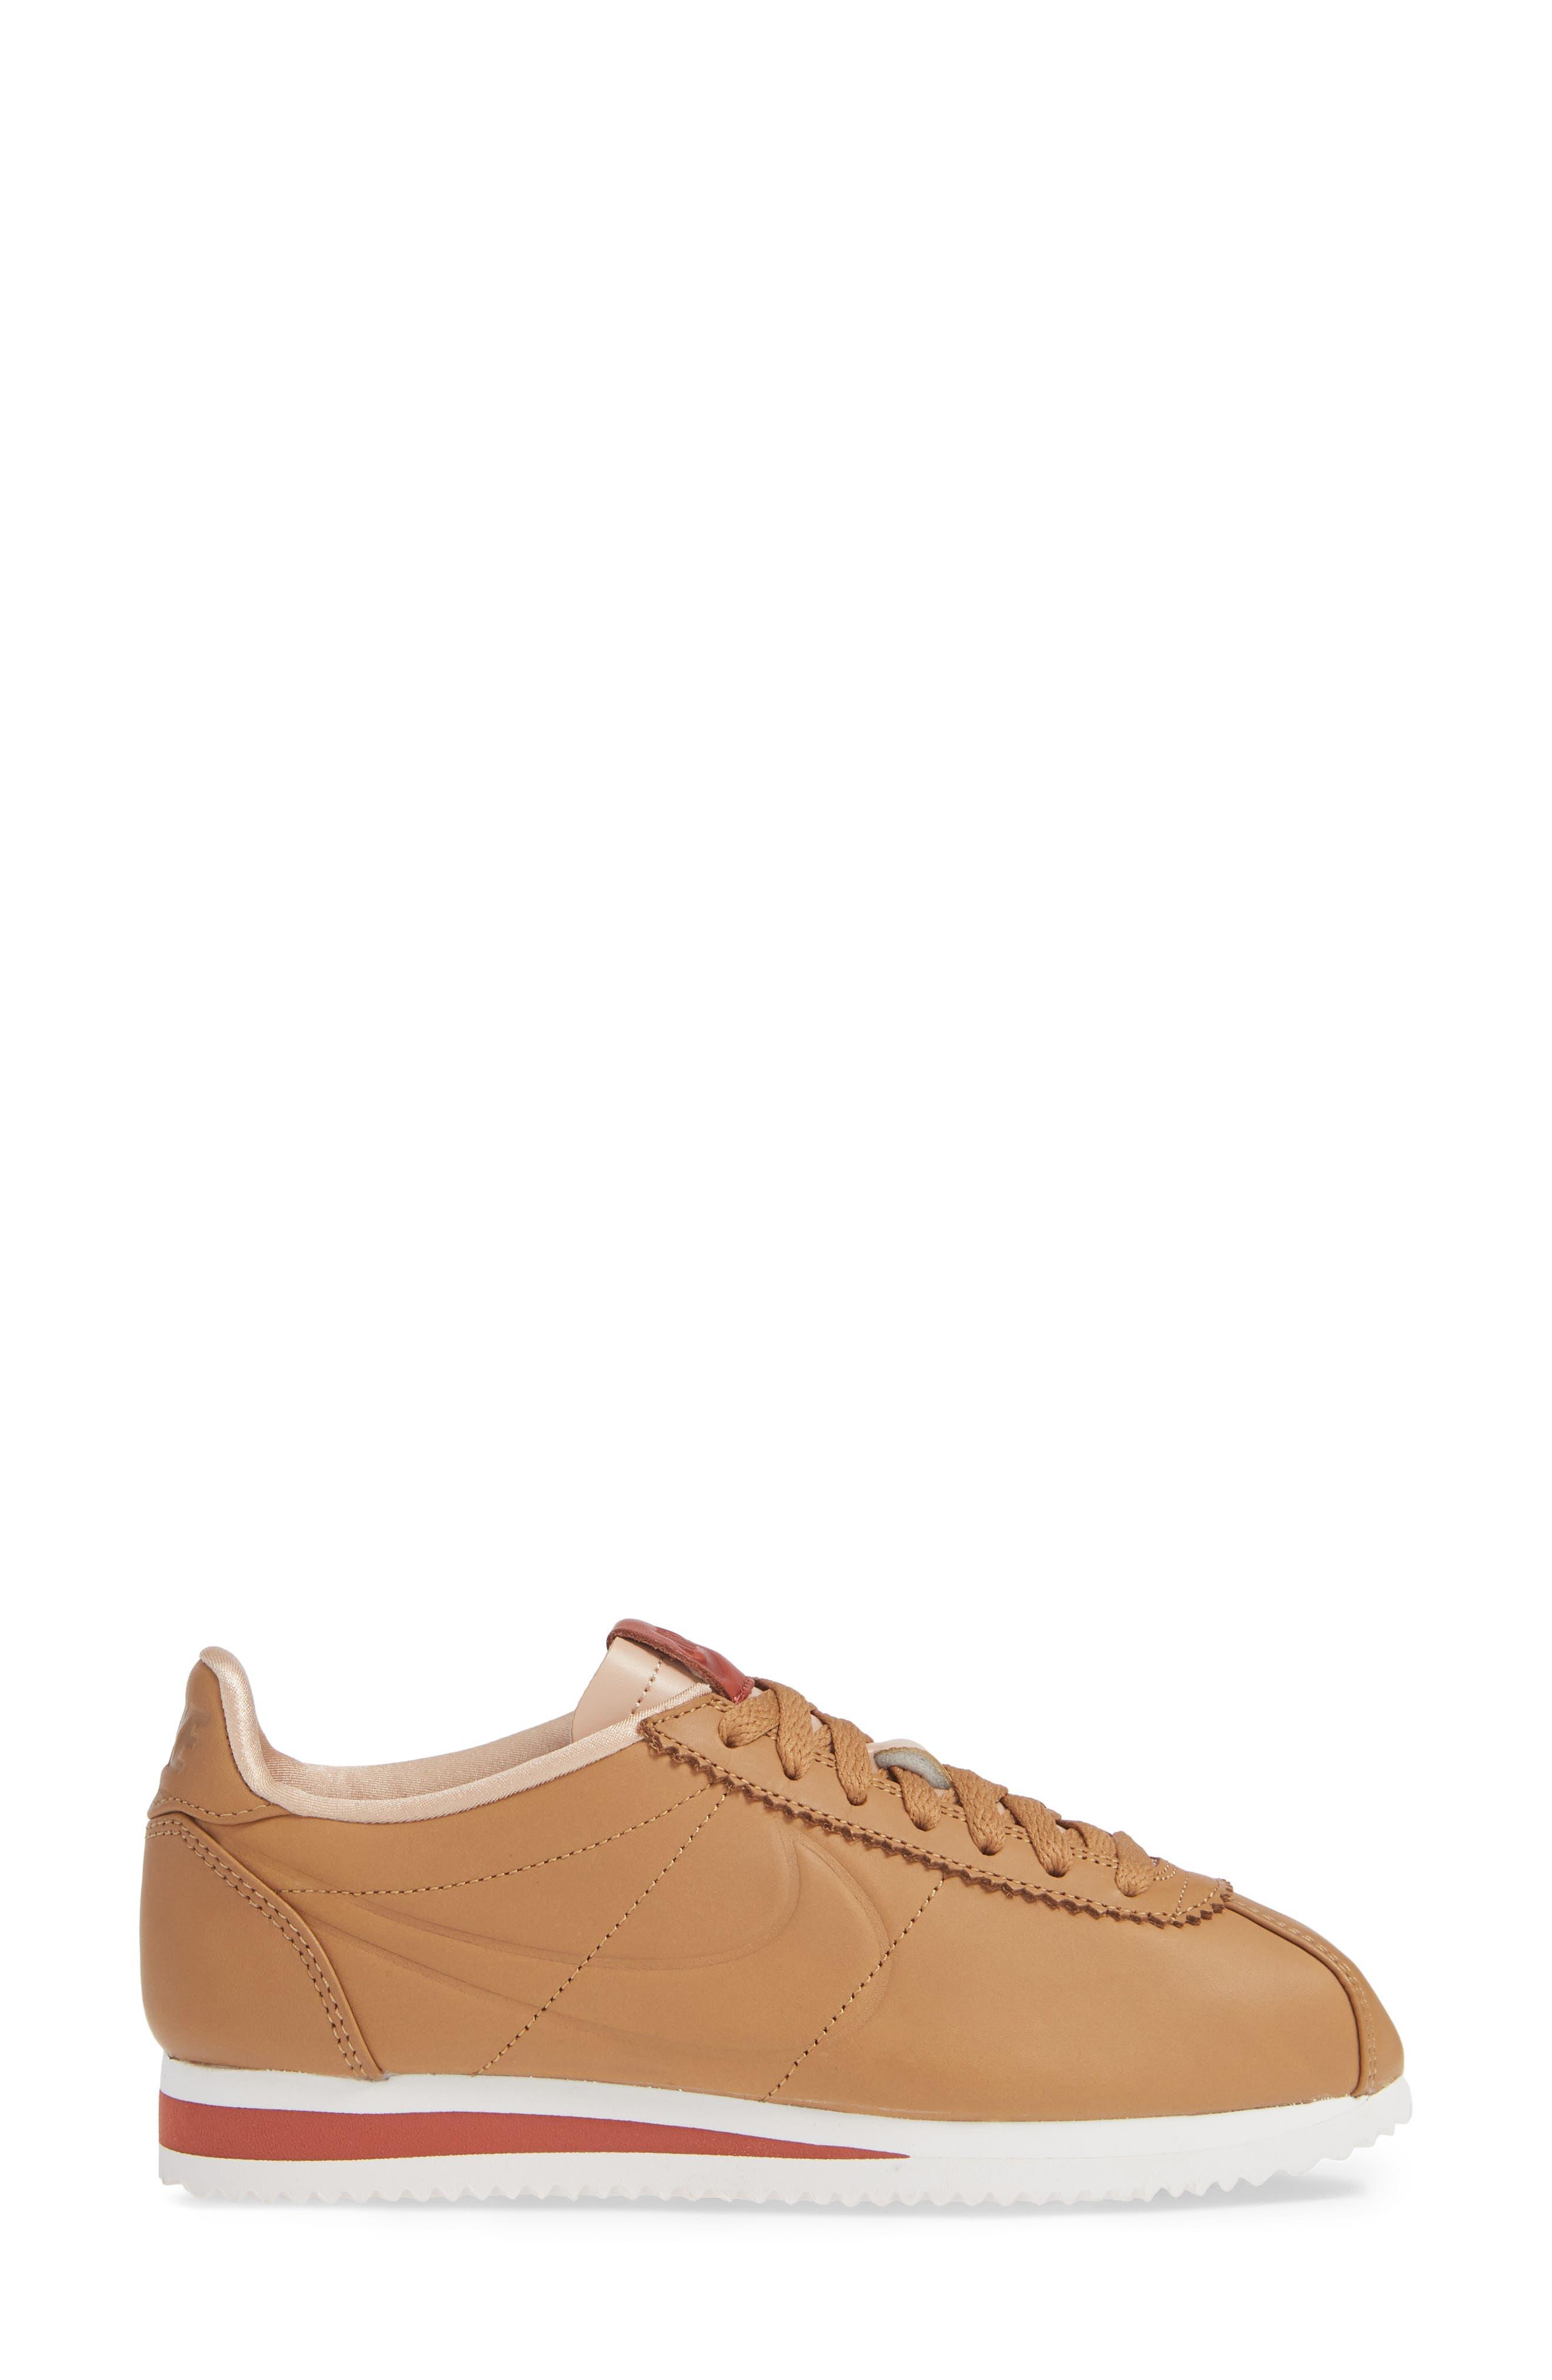 LA Cortez x Maria Sharapova Premium Sneaker,                             Alternate thumbnail 3, color,                             CAMEL/CAMEL